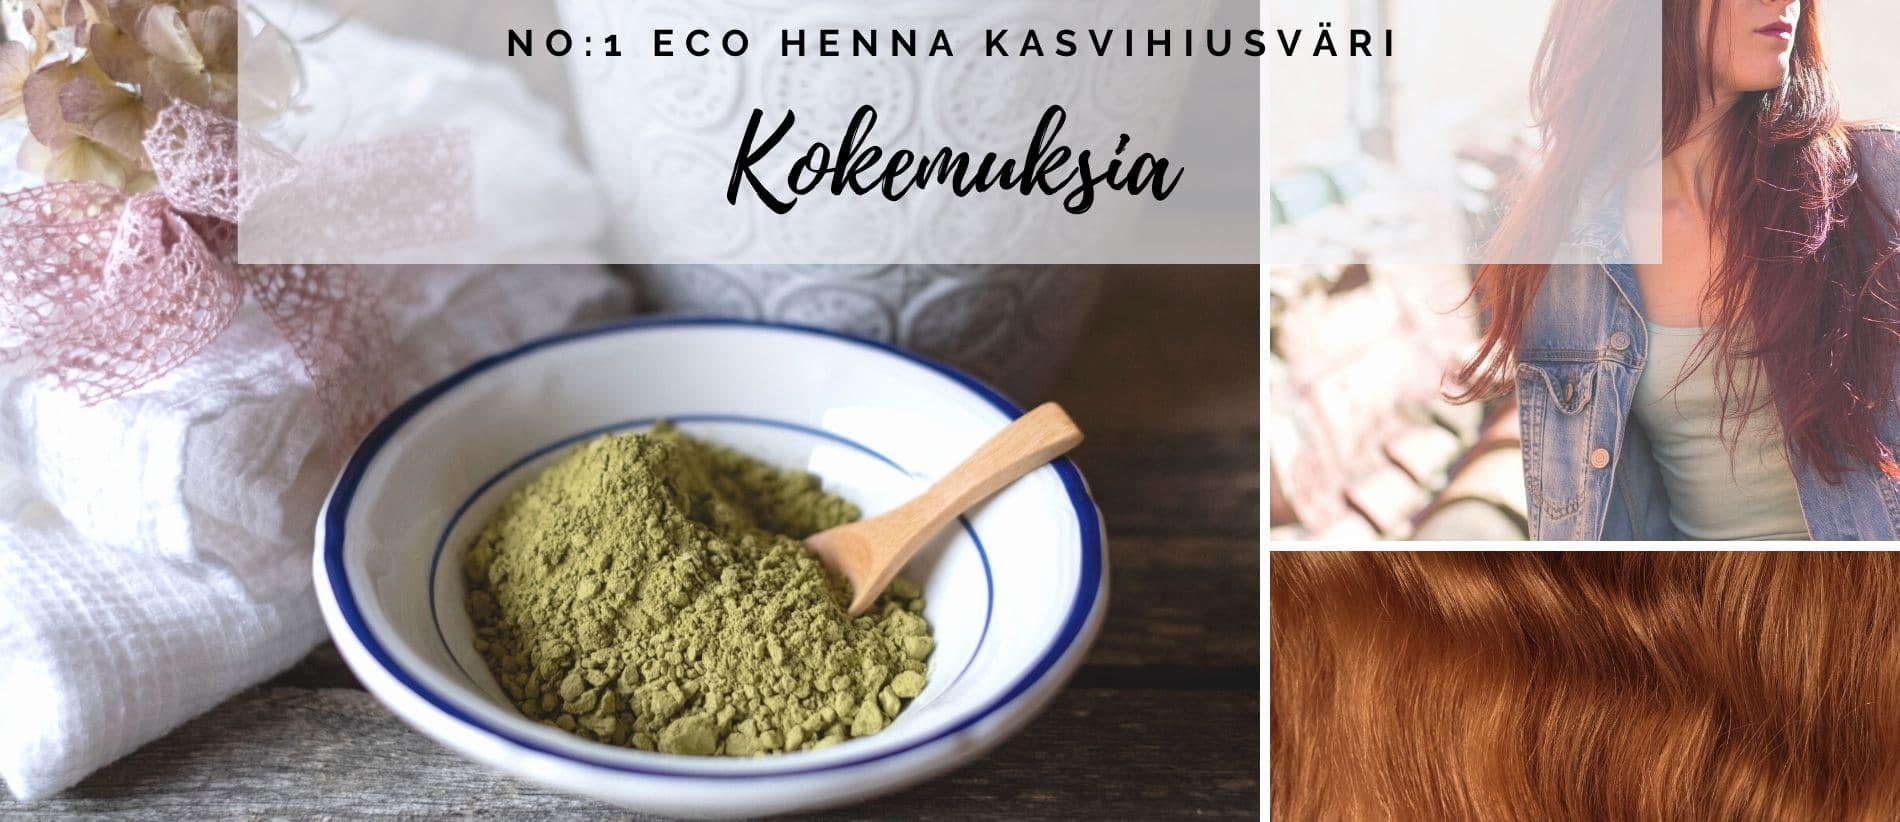 No_1 Eco Henna kasvihiusväri kokemuksia